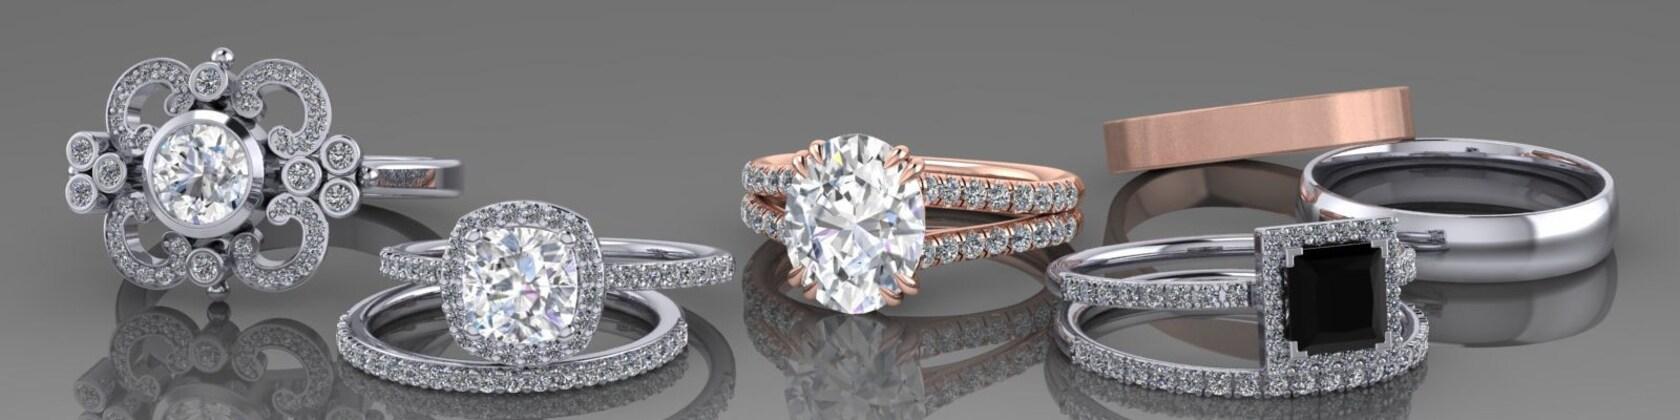 Diamond Moissanite Engagement Rings Wedding Bands von ArmanteDesign